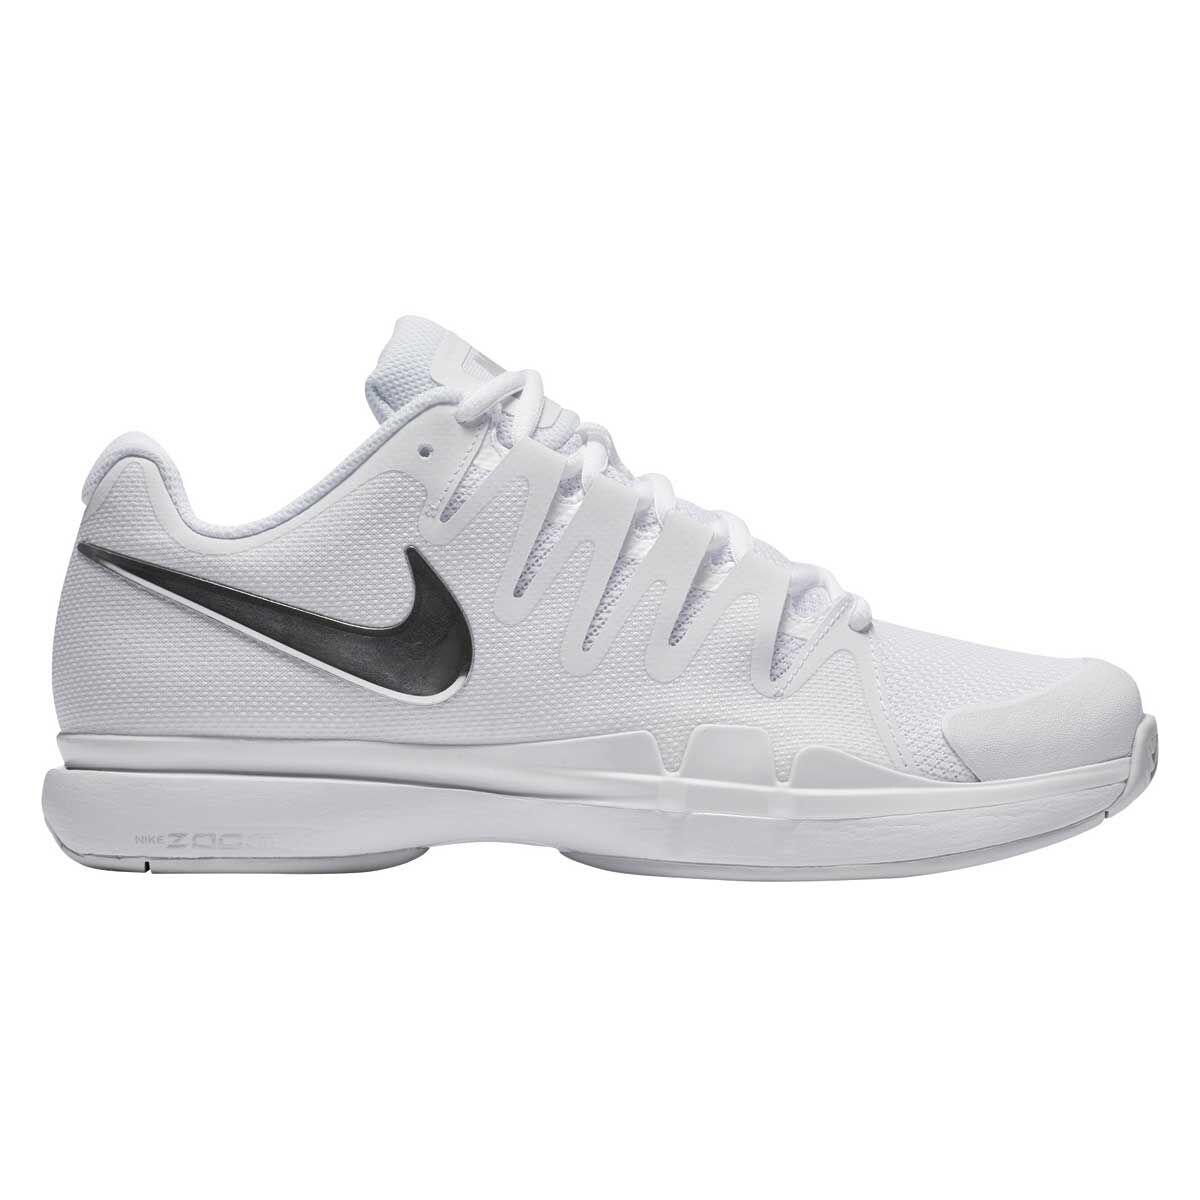 Nike Zoom Zapatos Vapor Tour Mujeres Tennis Zapatos Zoom Blanco  Silver Us e9bf82